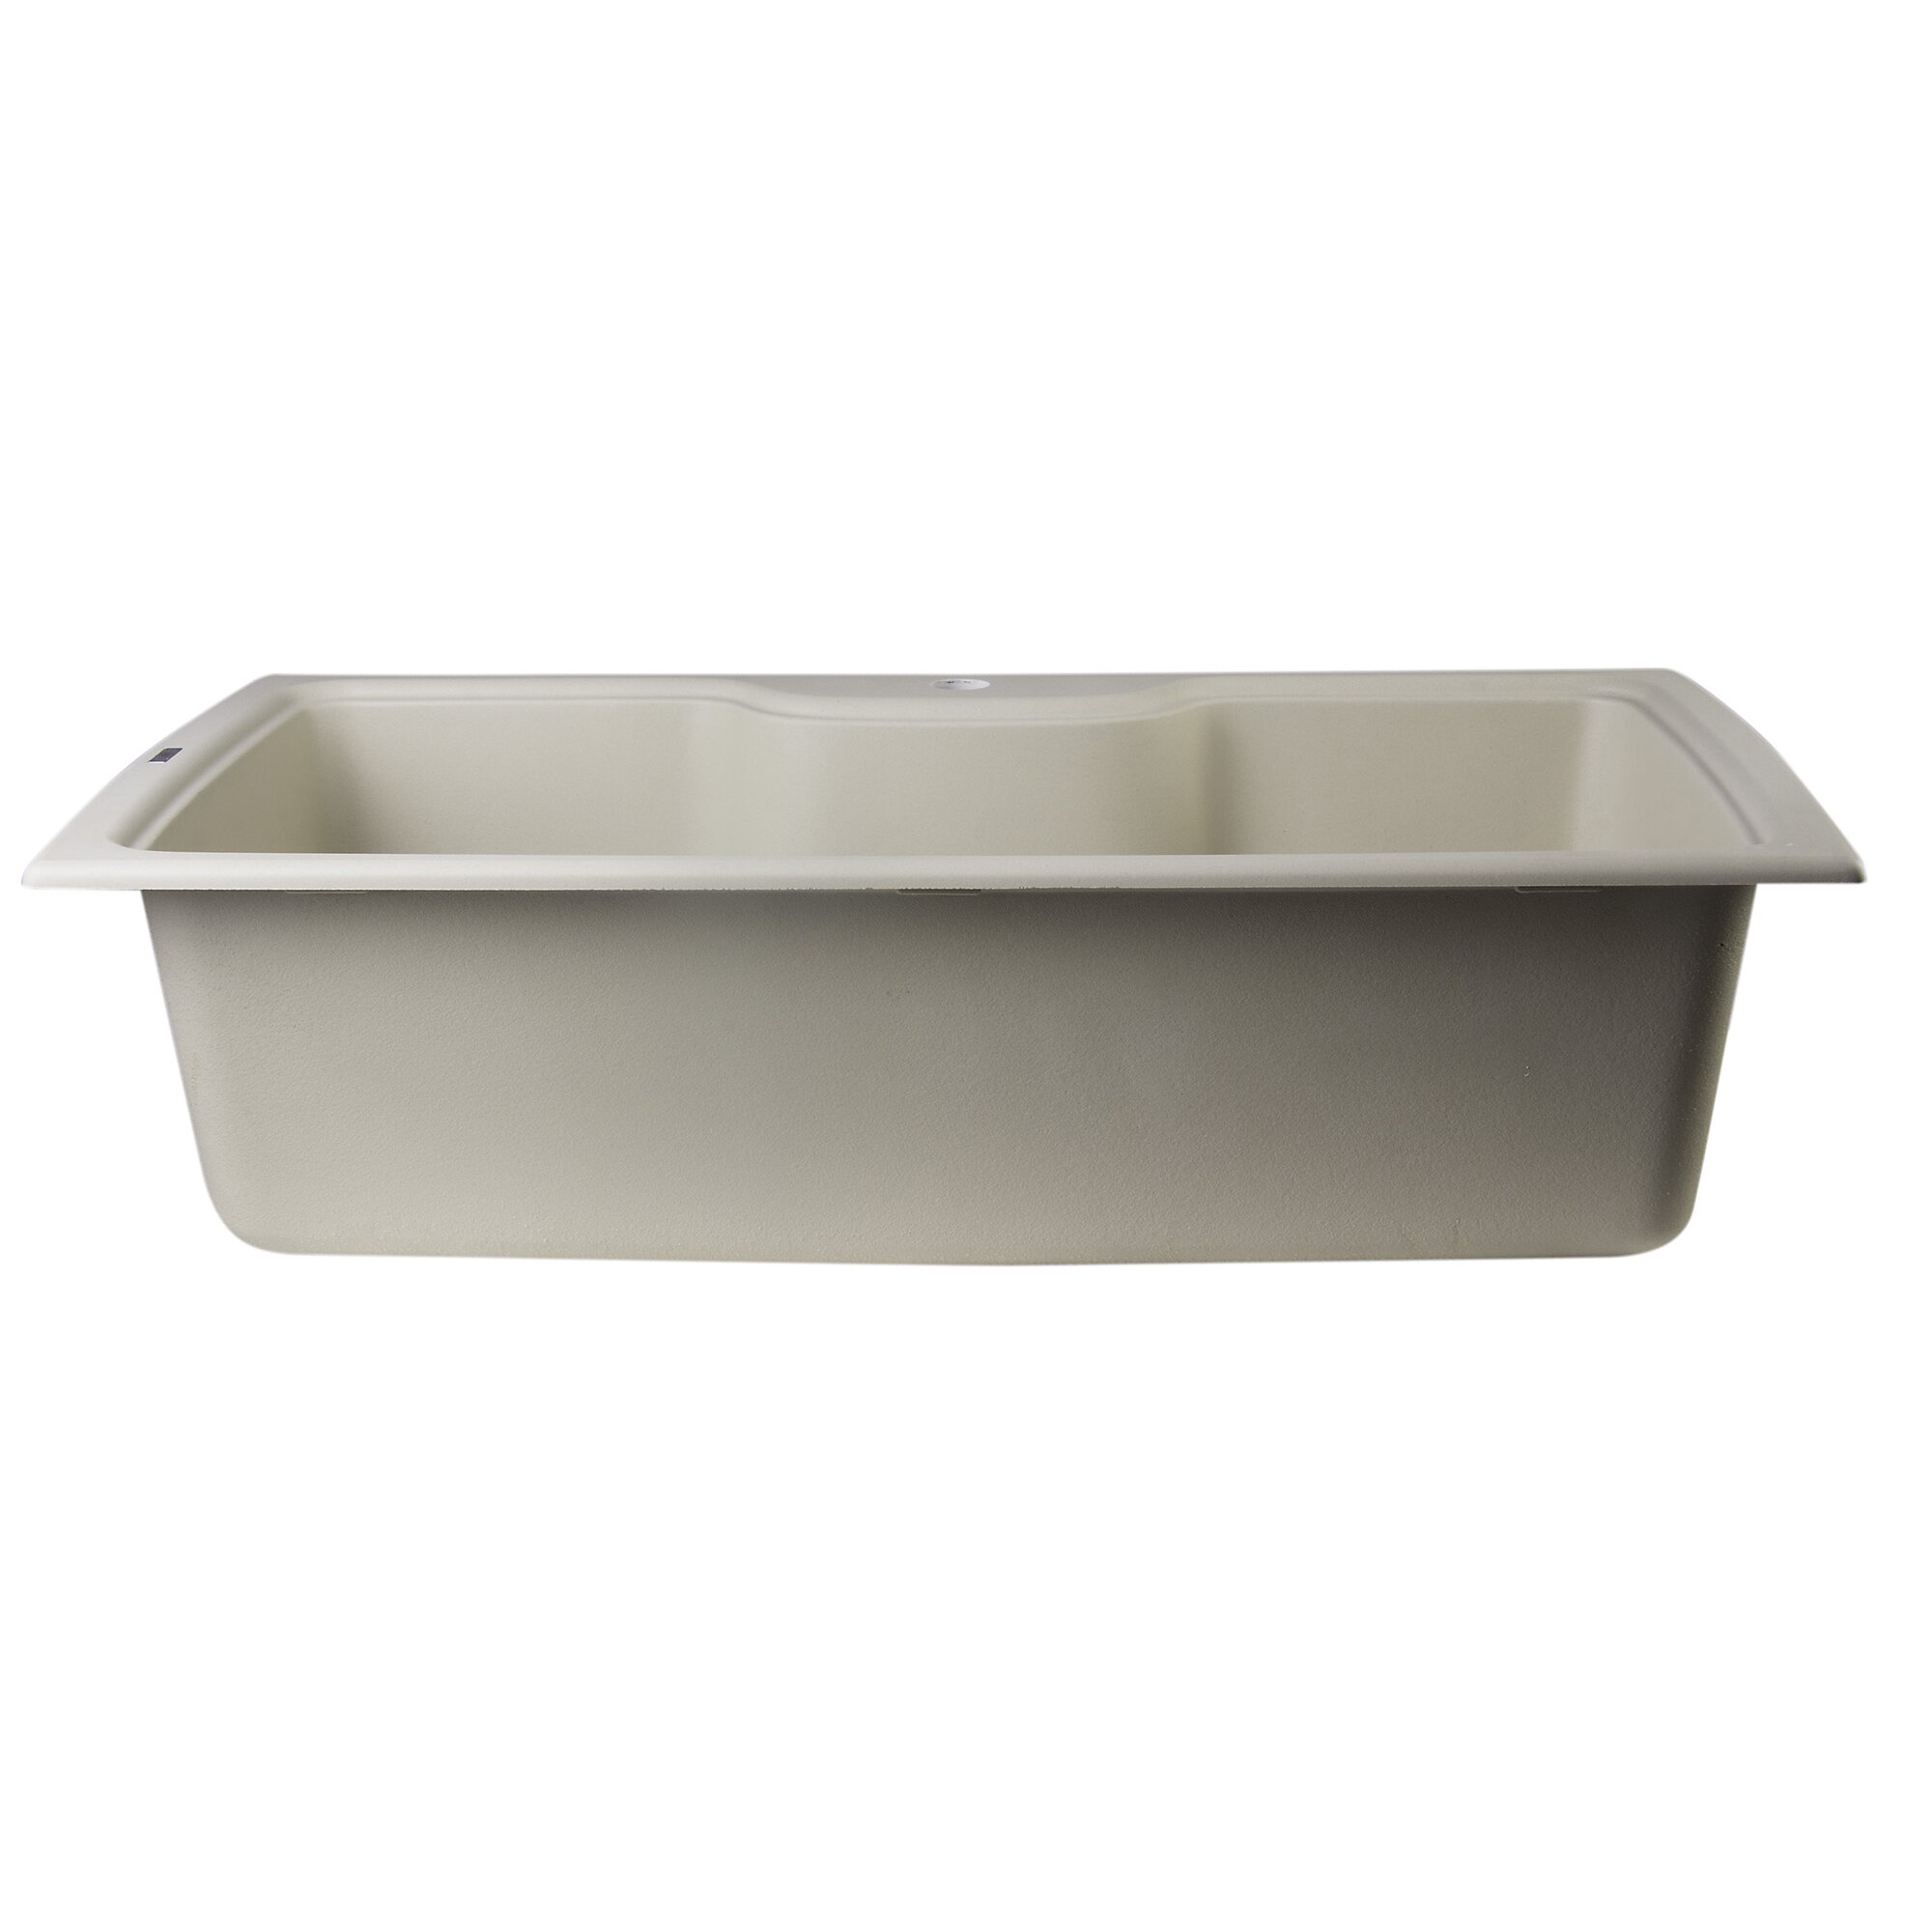 "34 63"" x 19 69"" Drop In Single Bowl Kitchen Sink"